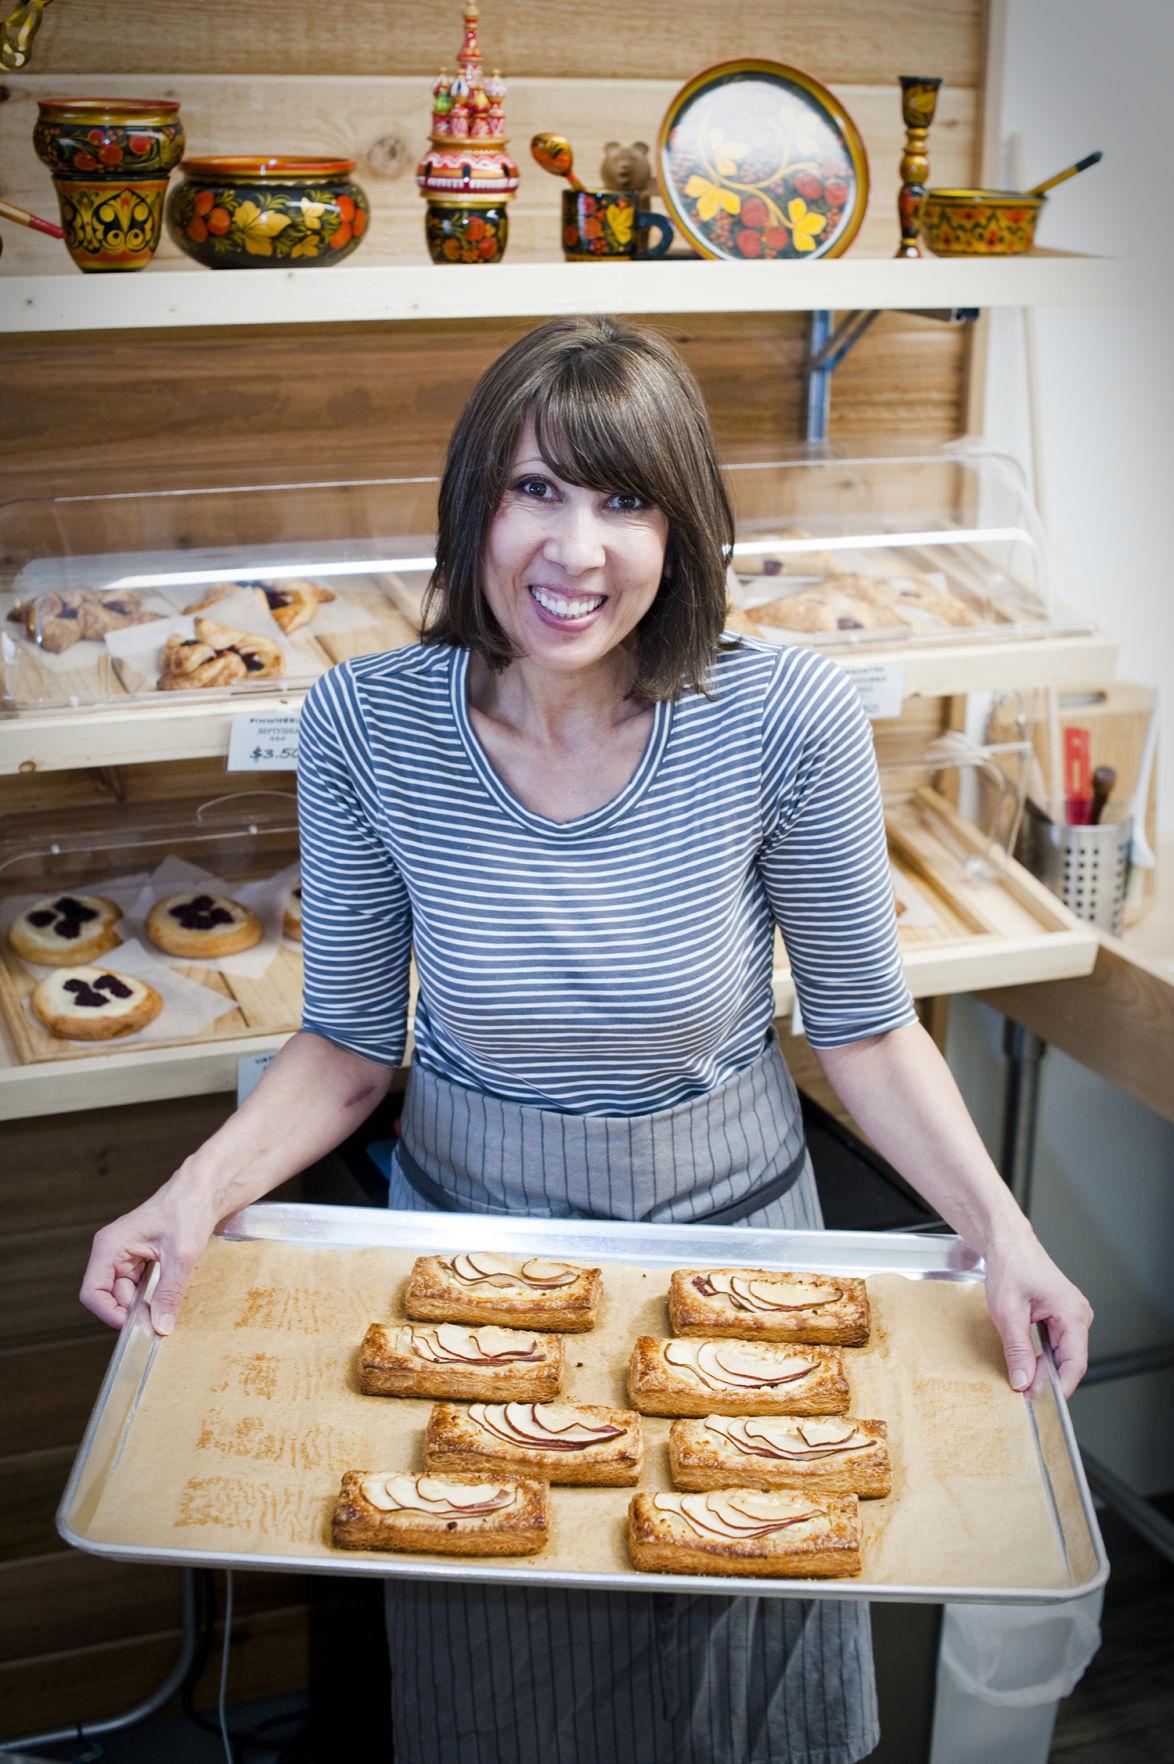 The Last Best Plates -- Veronika's Bakery, Billings